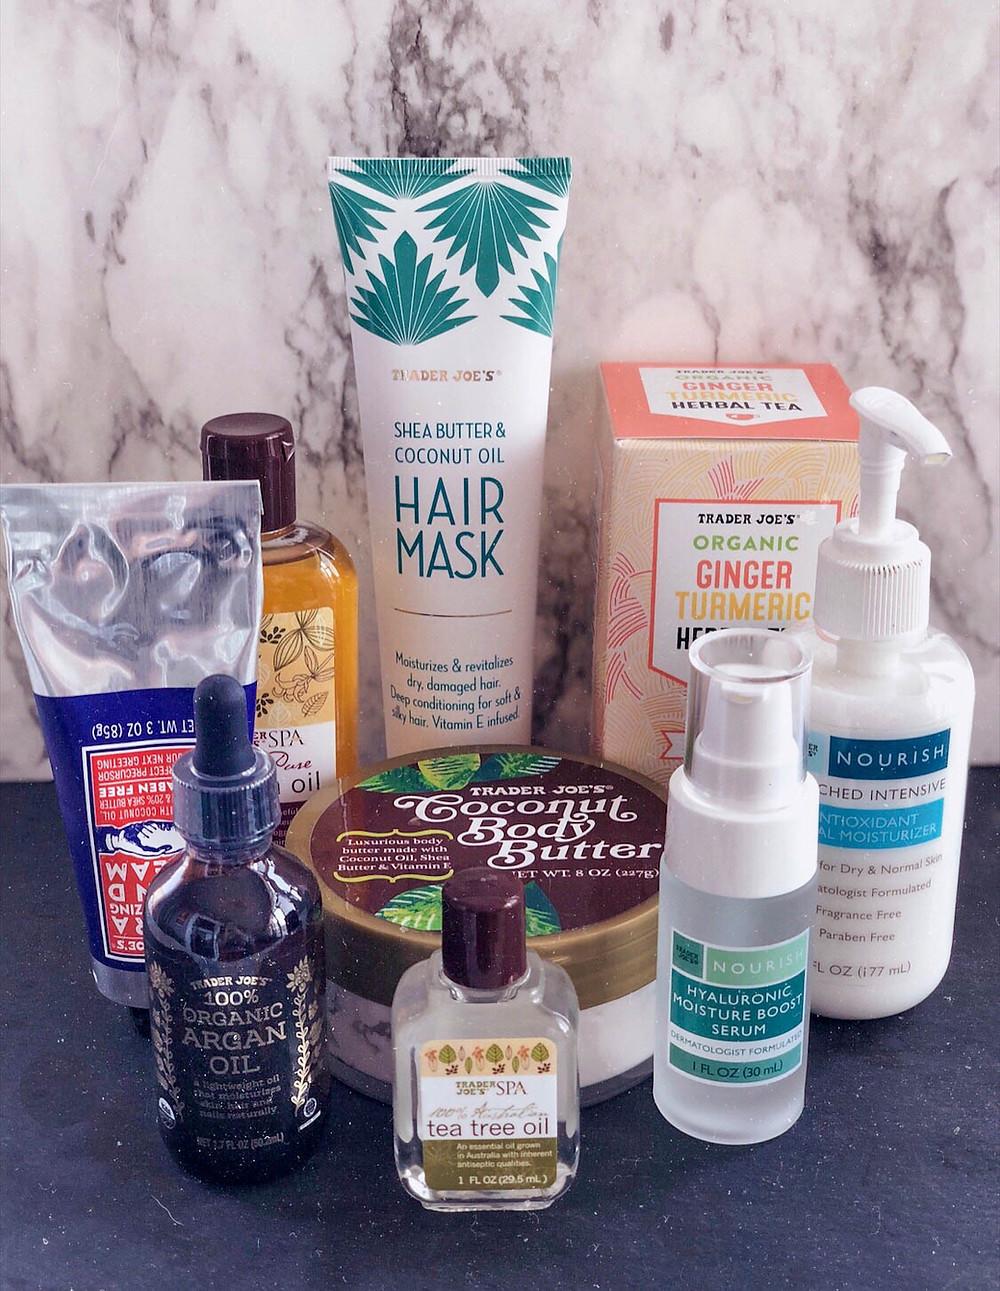 Trader Joe's Best Beauty Products hair mask, tea, facial moisturizer, serum, tea tree oil, body butter, organ oil, hand cream, jojoba oil